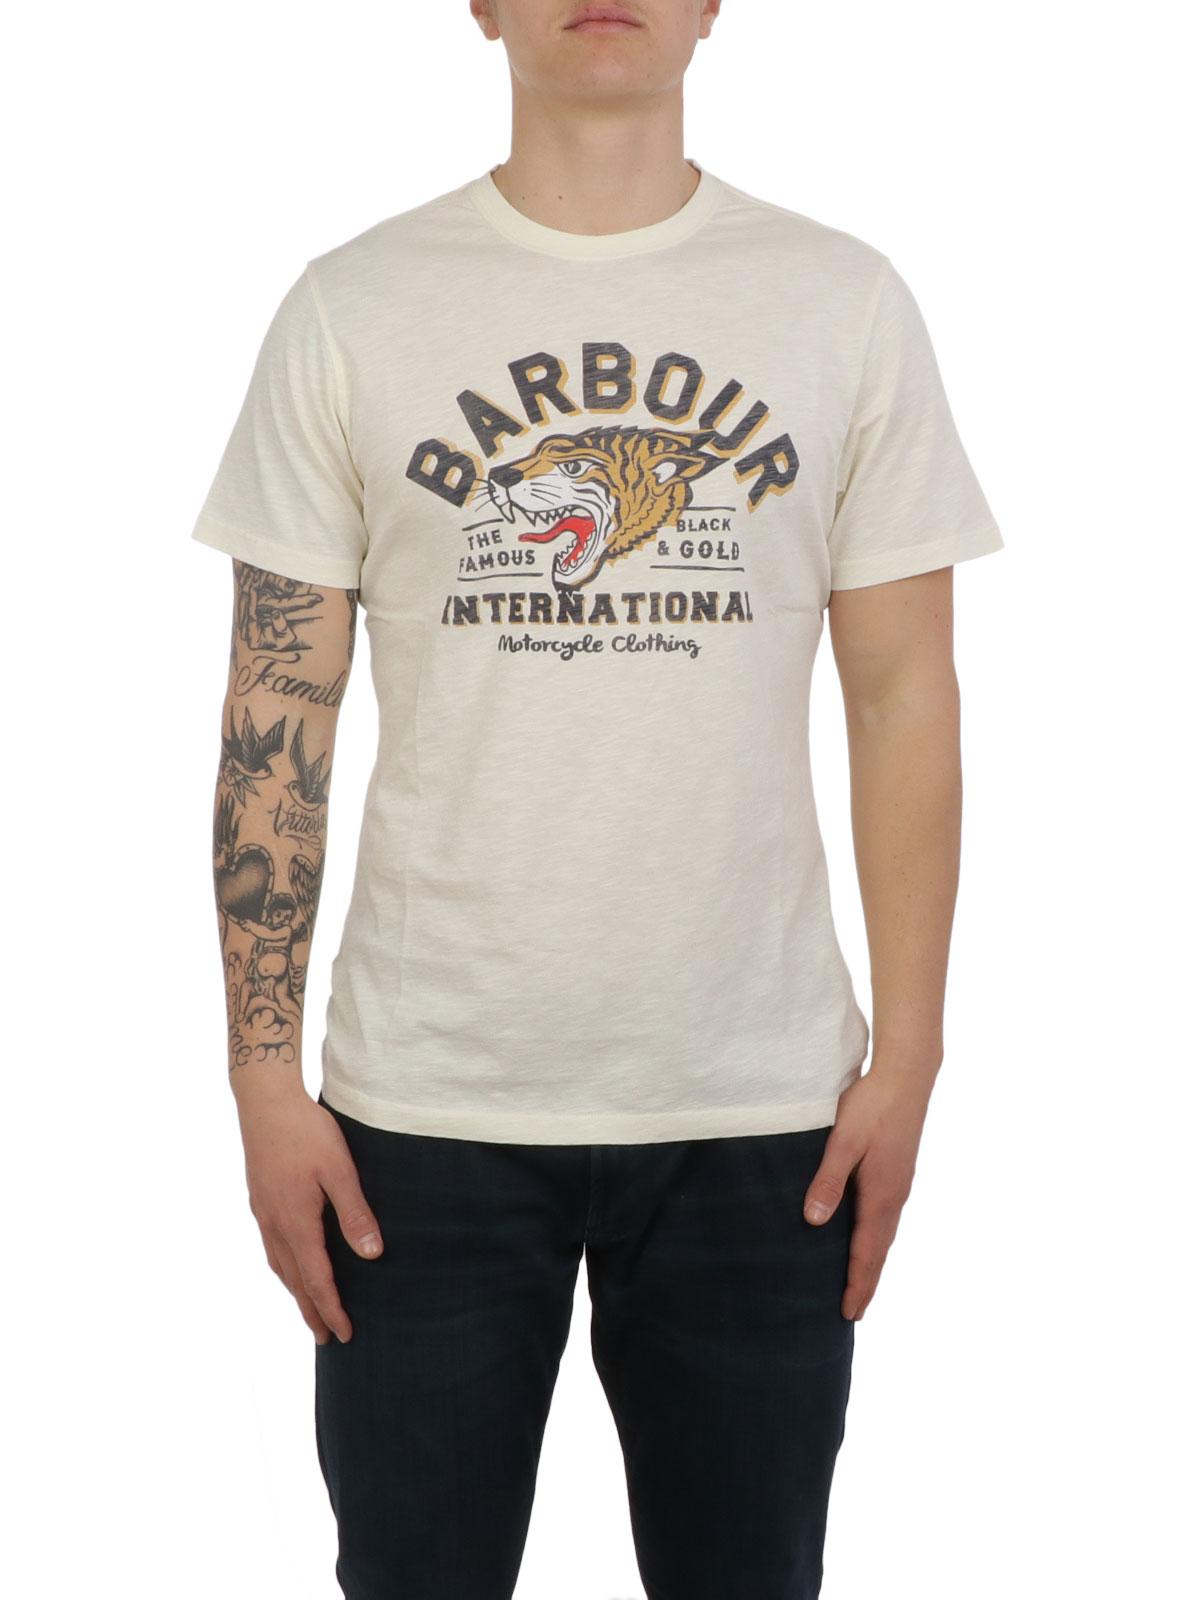 Immagine di BARBOUR | T-Shirt Uomo Device